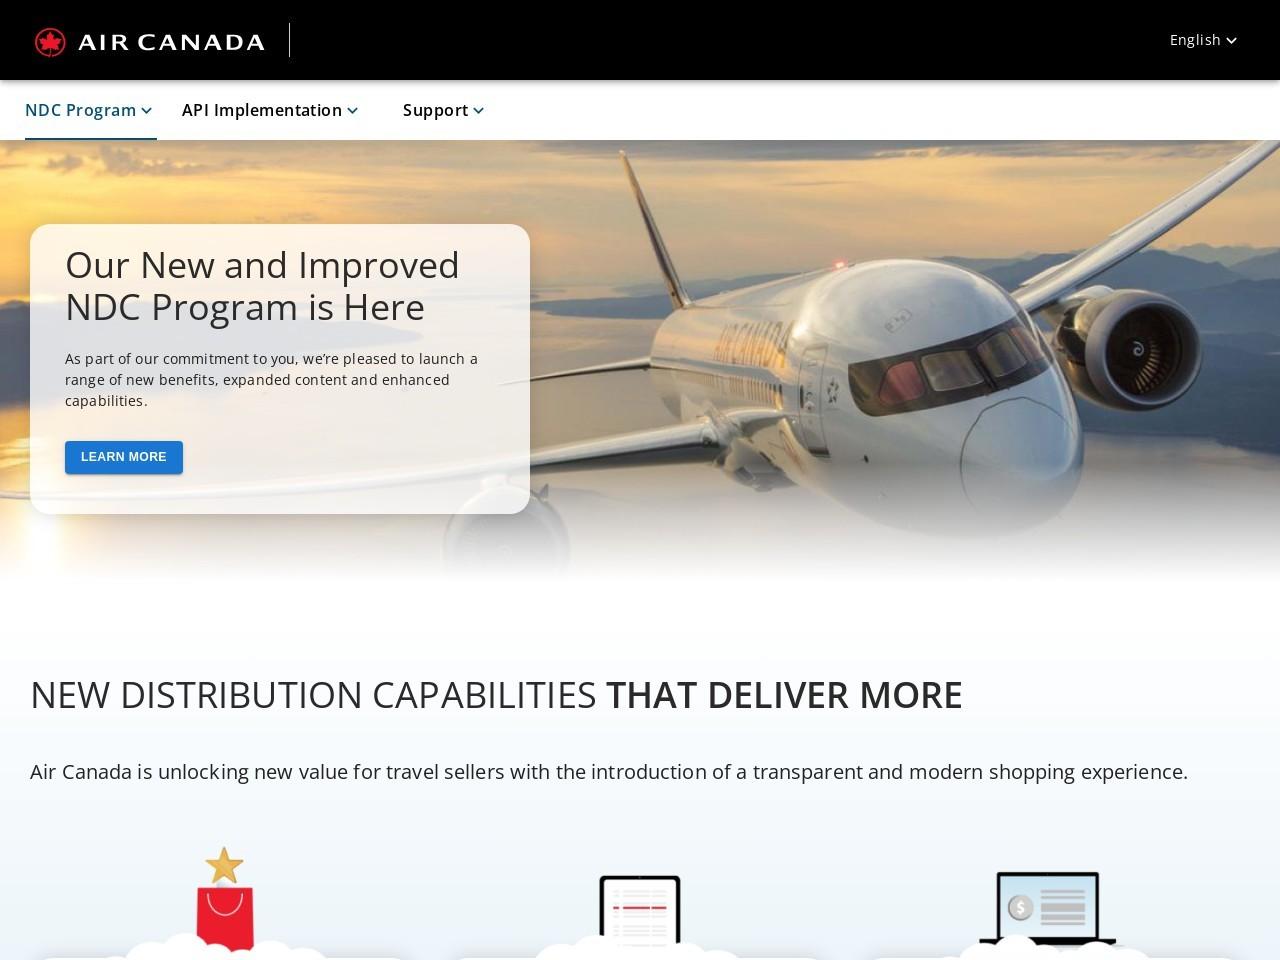 https://www.aircanada.com/us/en/aco/home/book/ndc.html